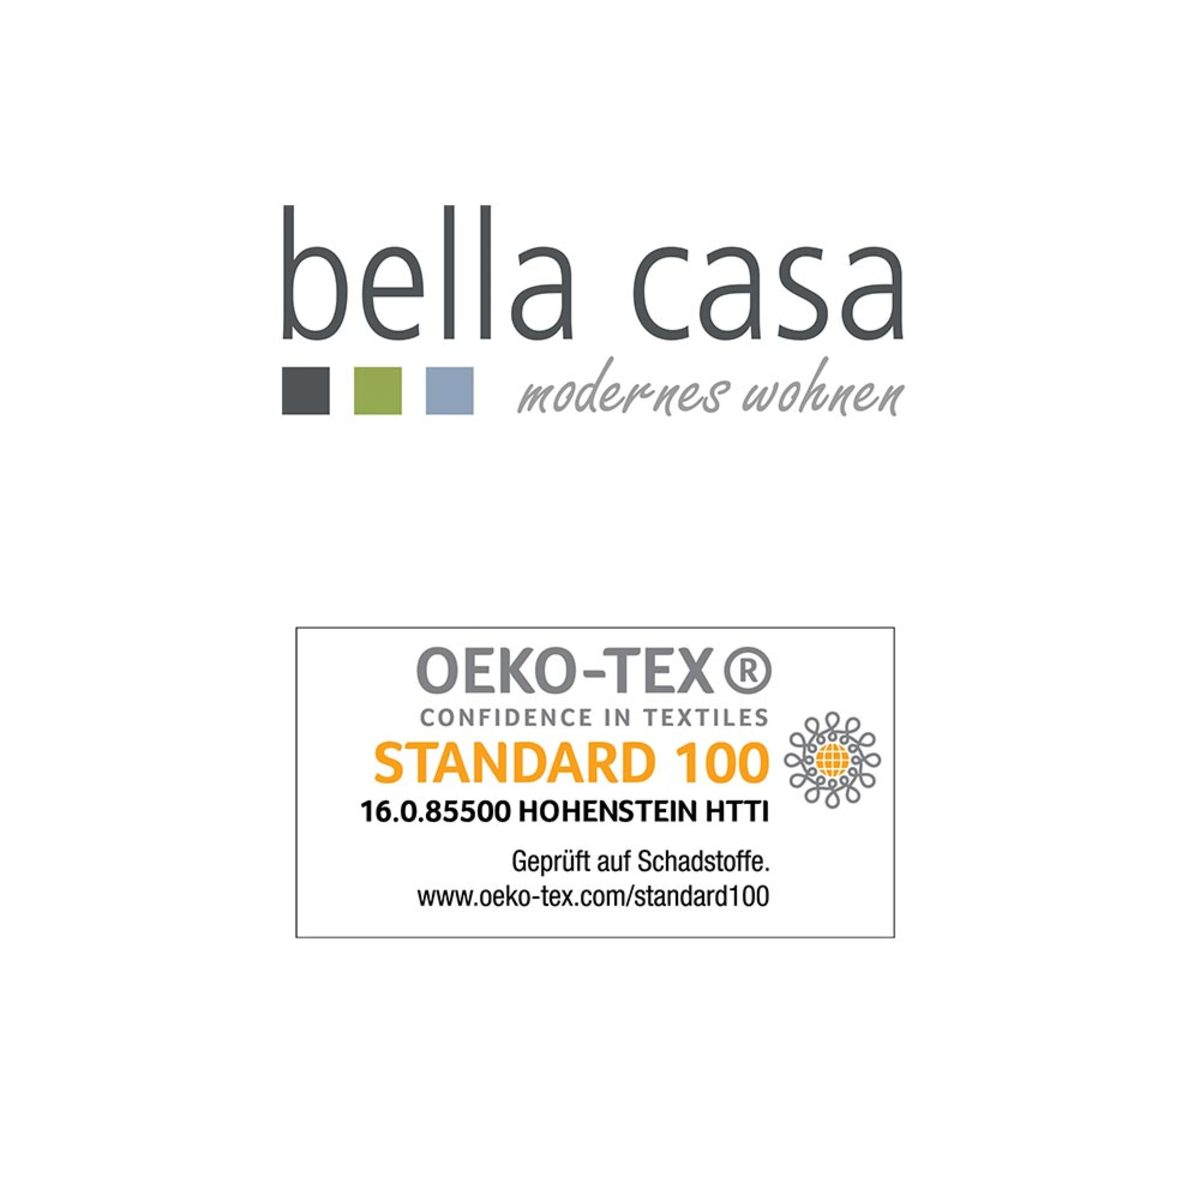 Bild 2 von Bella Casa Coral Sherpa Decke, ca. 150 x 200 cm, Federn